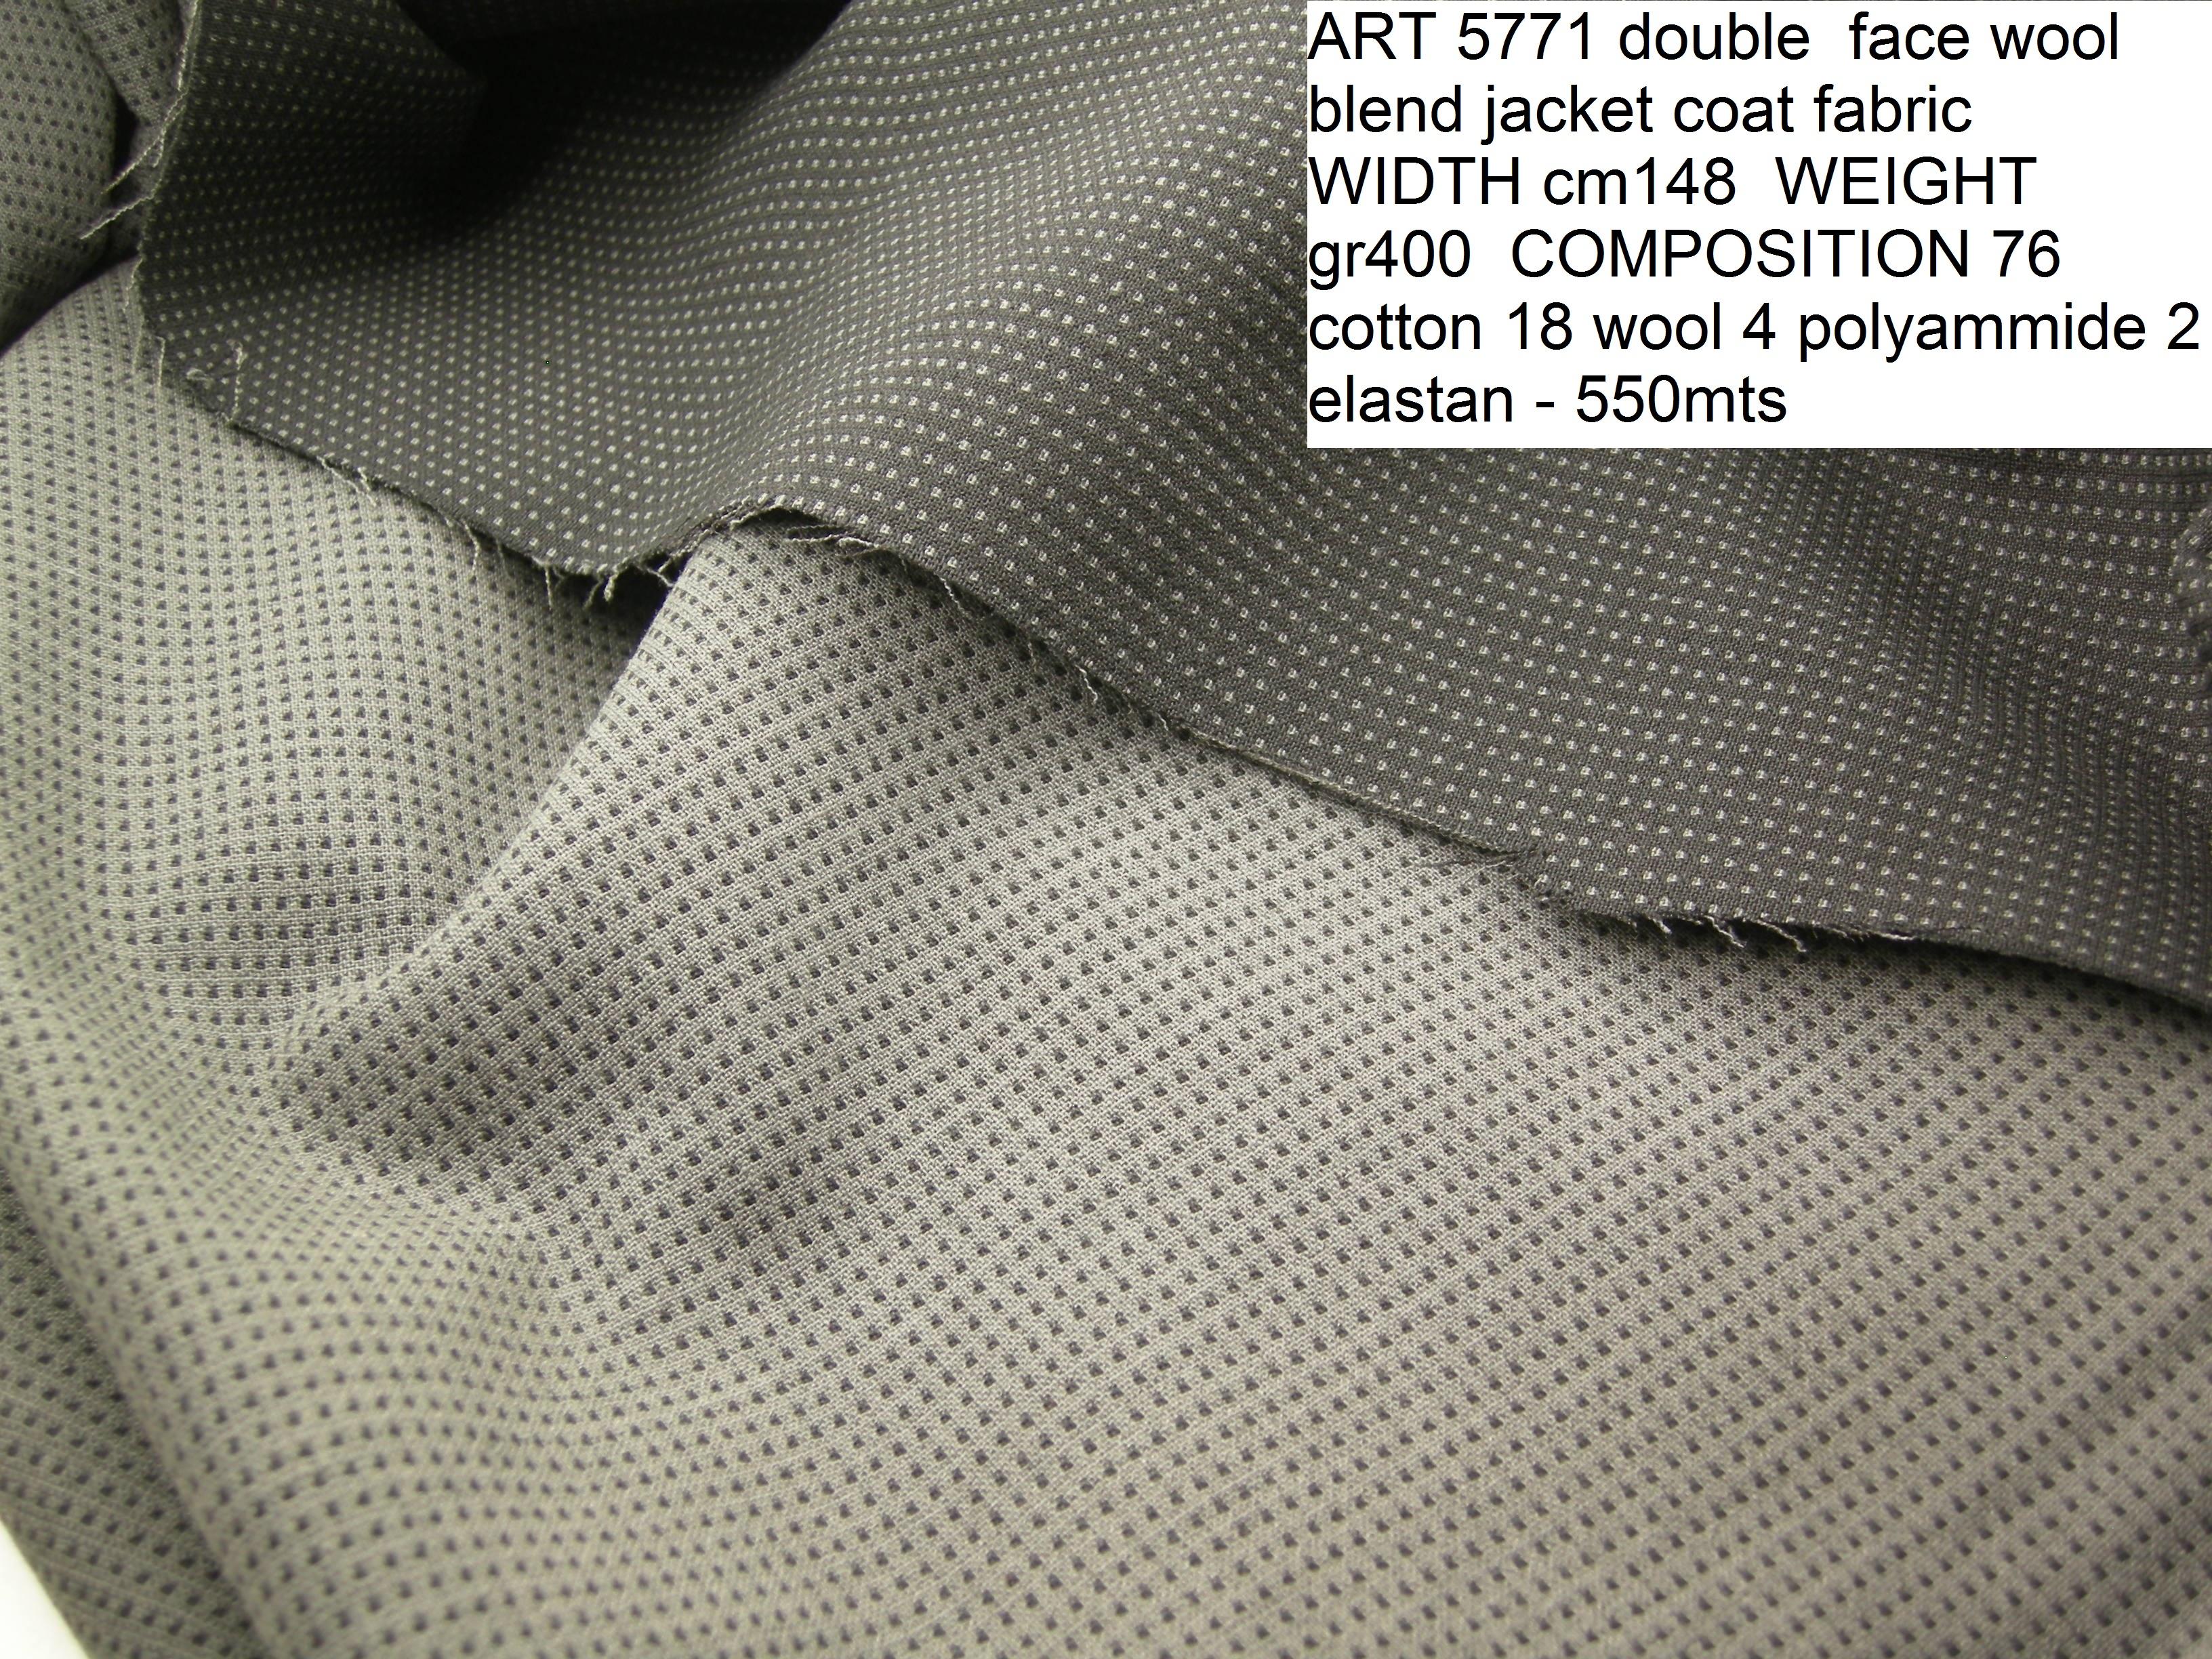 ART 5771 double face wool blend jacket coat fabric WIDTH cm148 WEIGHT gr400 COMPOSITION 76 cotton 18 wool 4 polyammide 2 elastan - 550mts